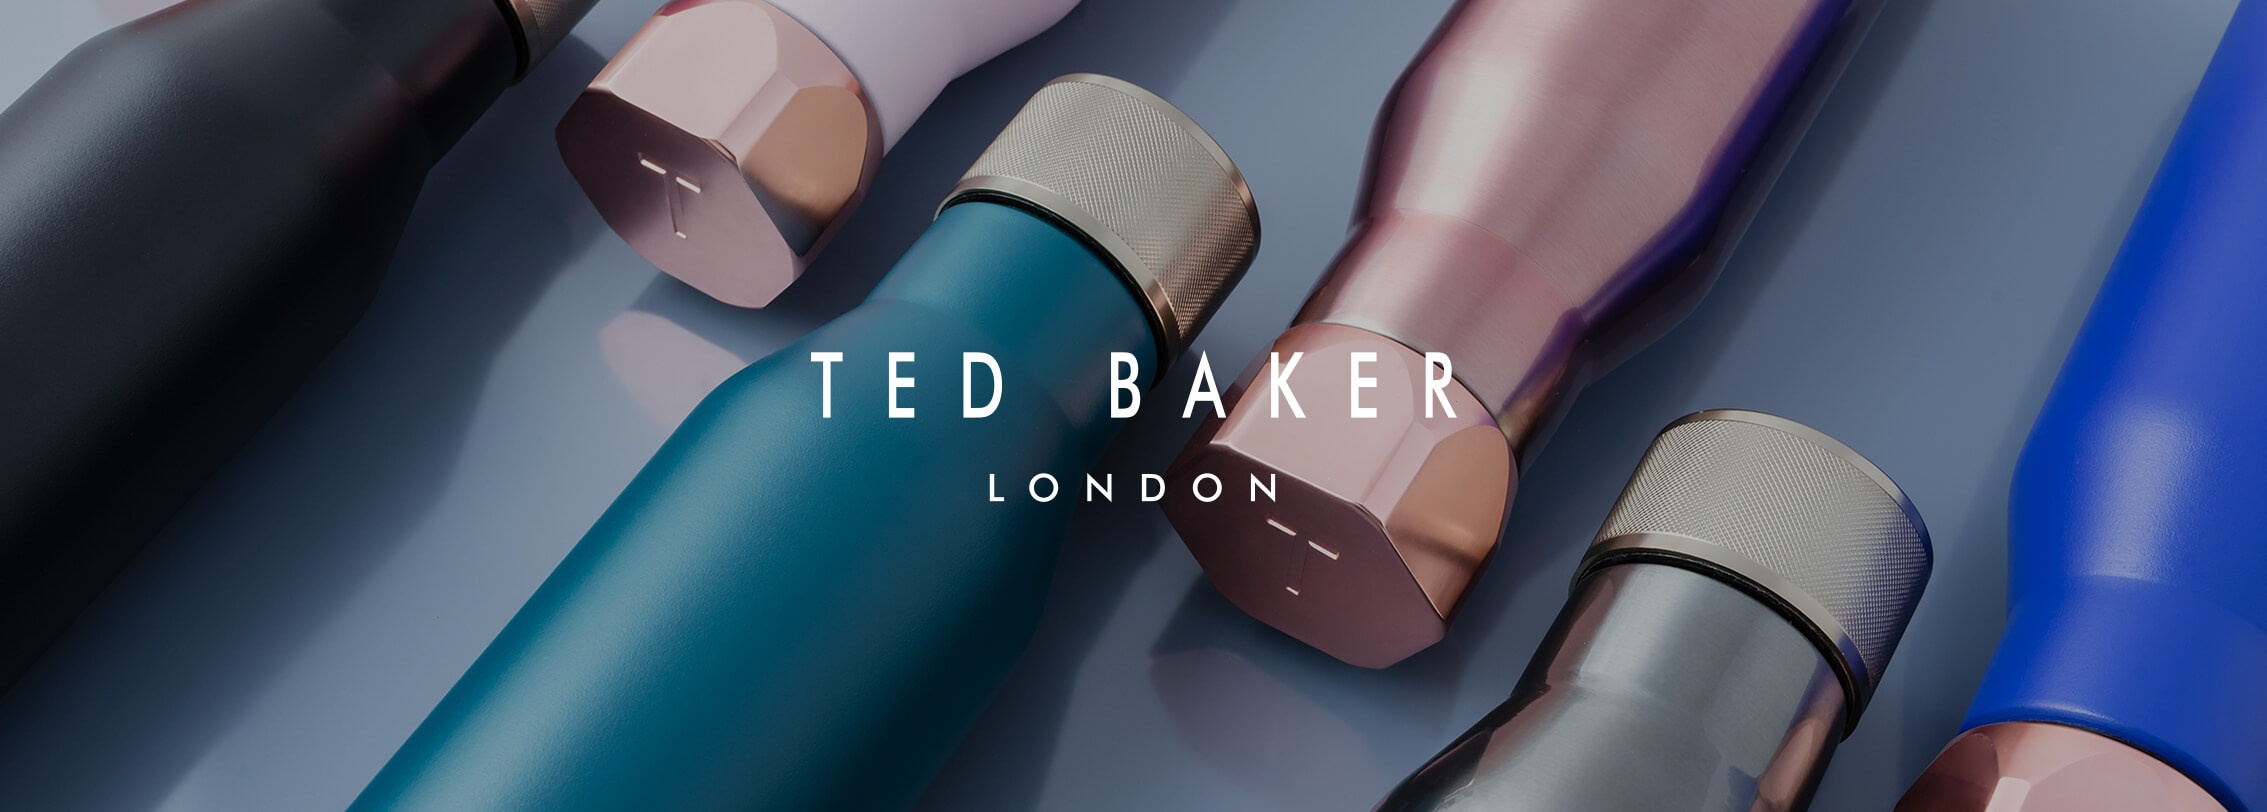 Ted Baker for all